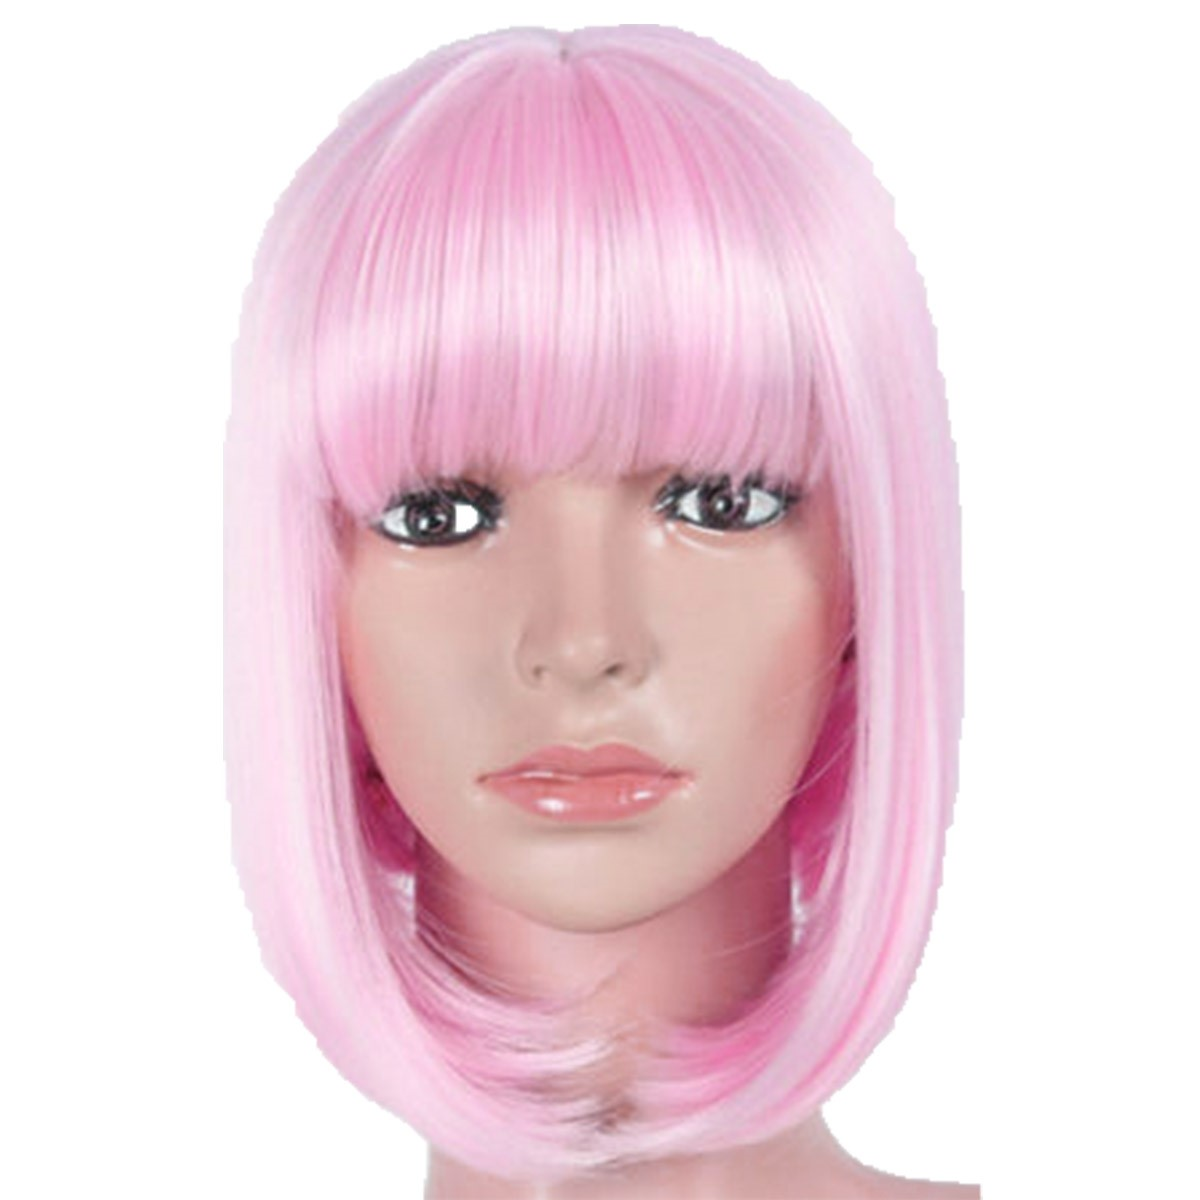 Wigs Uk Costume 72